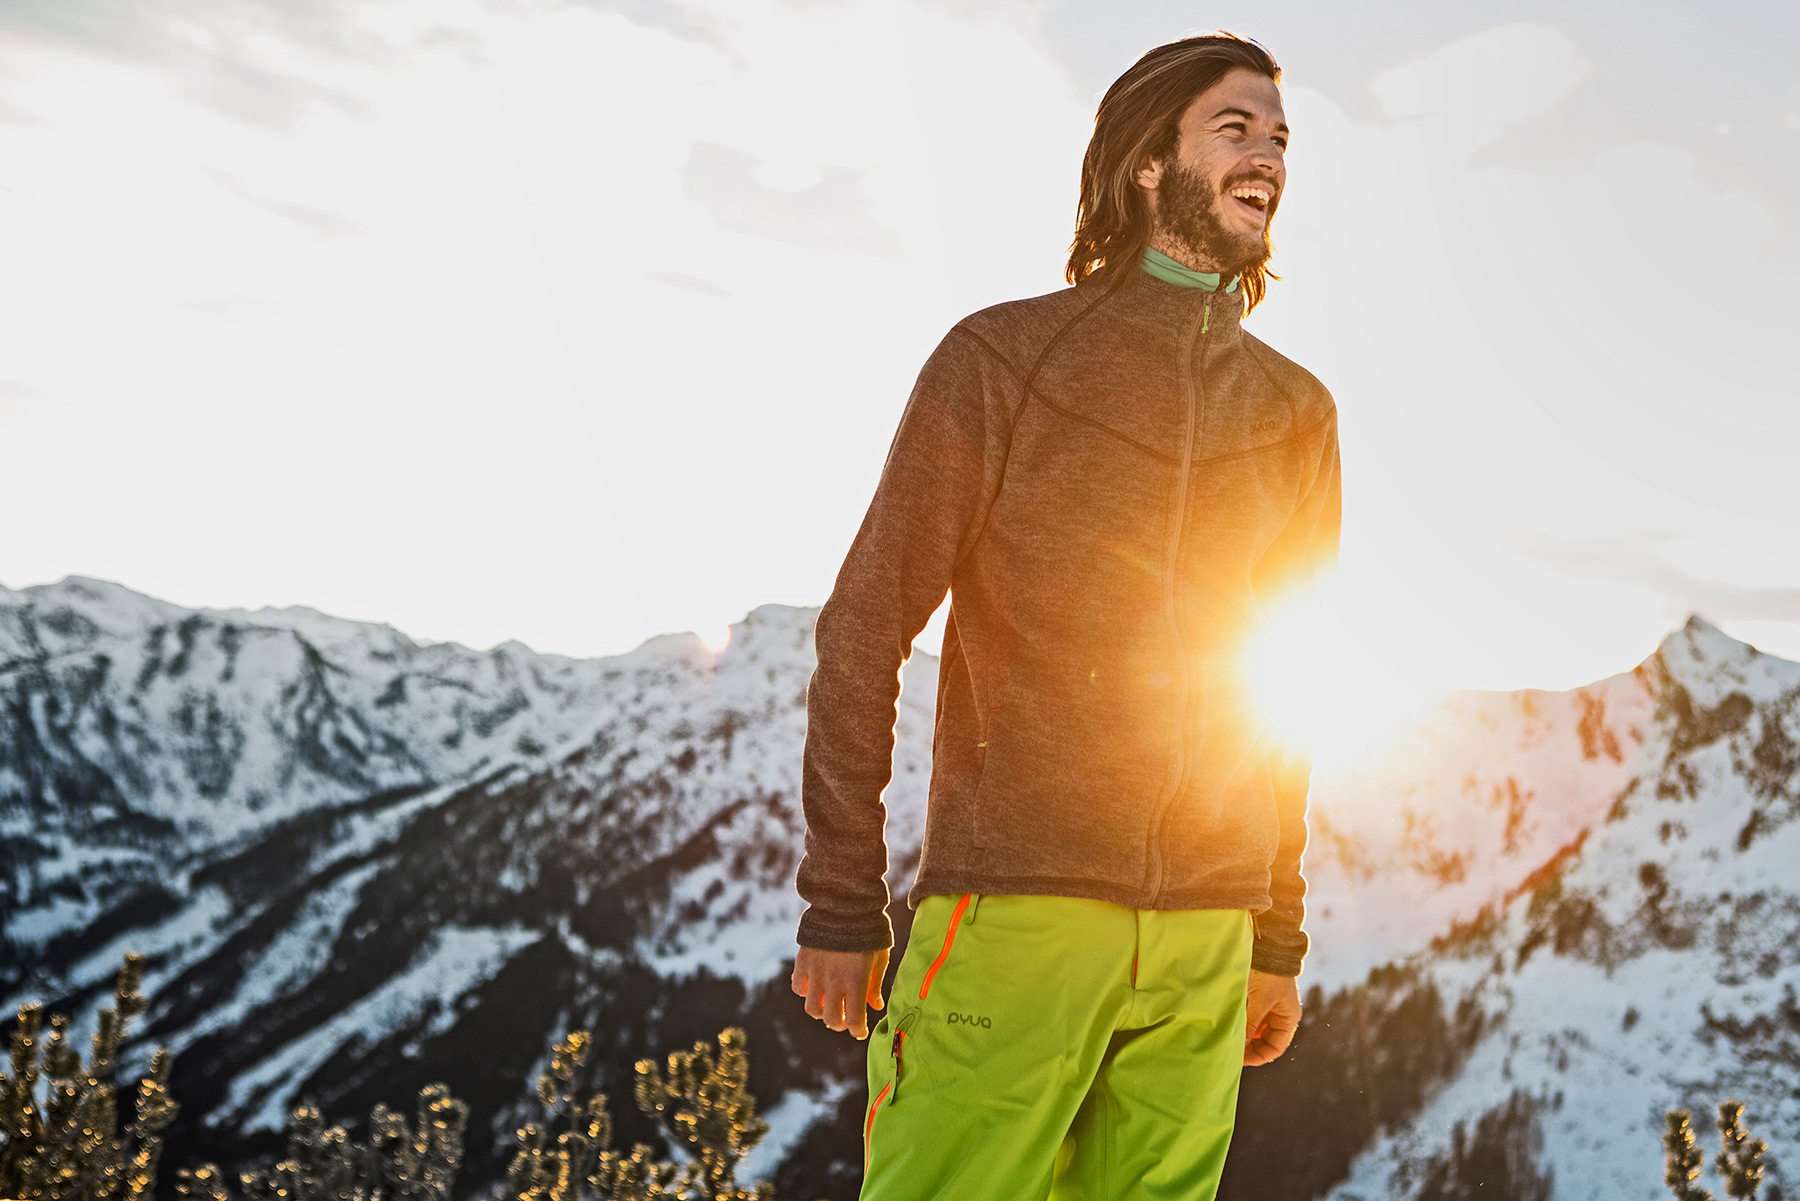 18-Pyua-Dachstein-Ski-Action-Christoph-Gramann